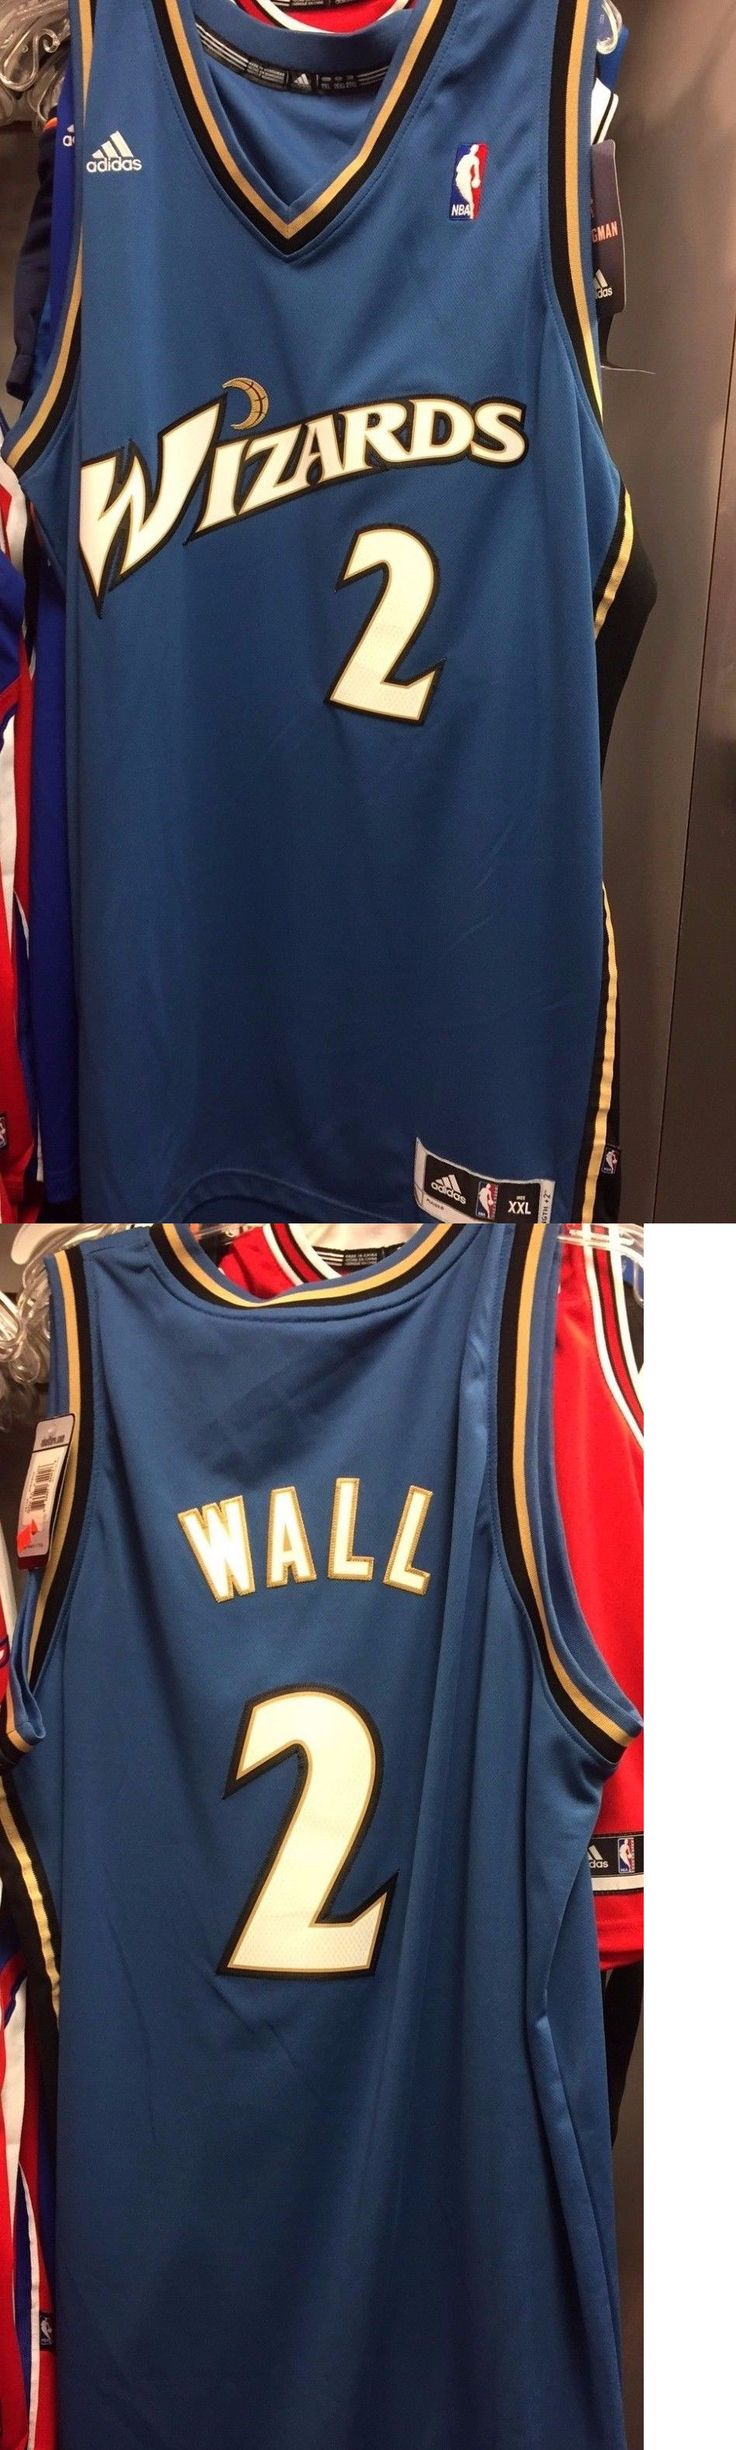 Basketball-NBA 24442: Nba Adidas Swingman Jersey Washington Wizards John Wall -> BUY IT NOW ONLY: $44.99 on eBay!